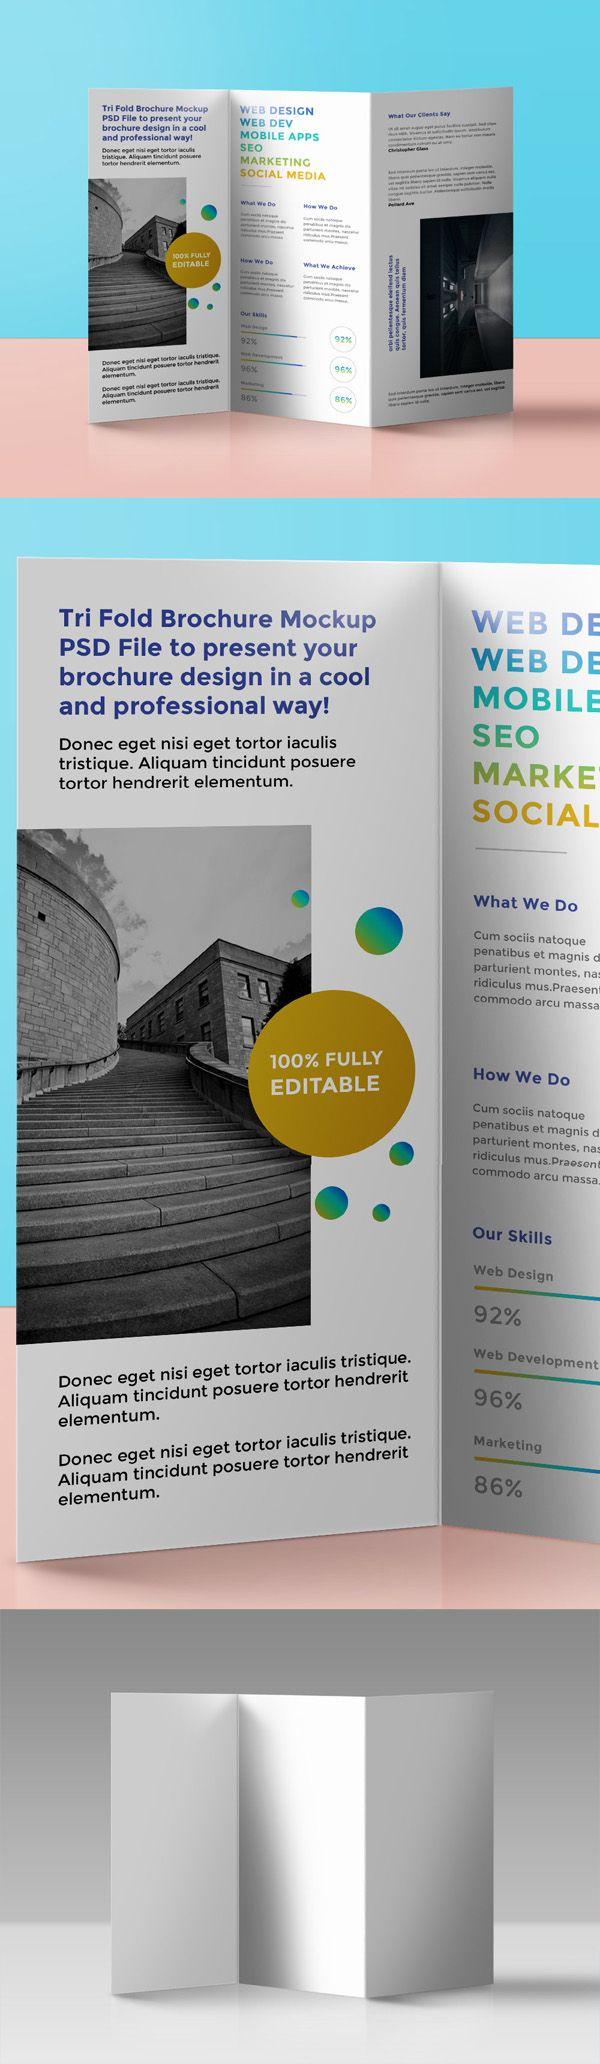 brochure 3 fold template psd - free tri fold brochure mockup psd free psd files